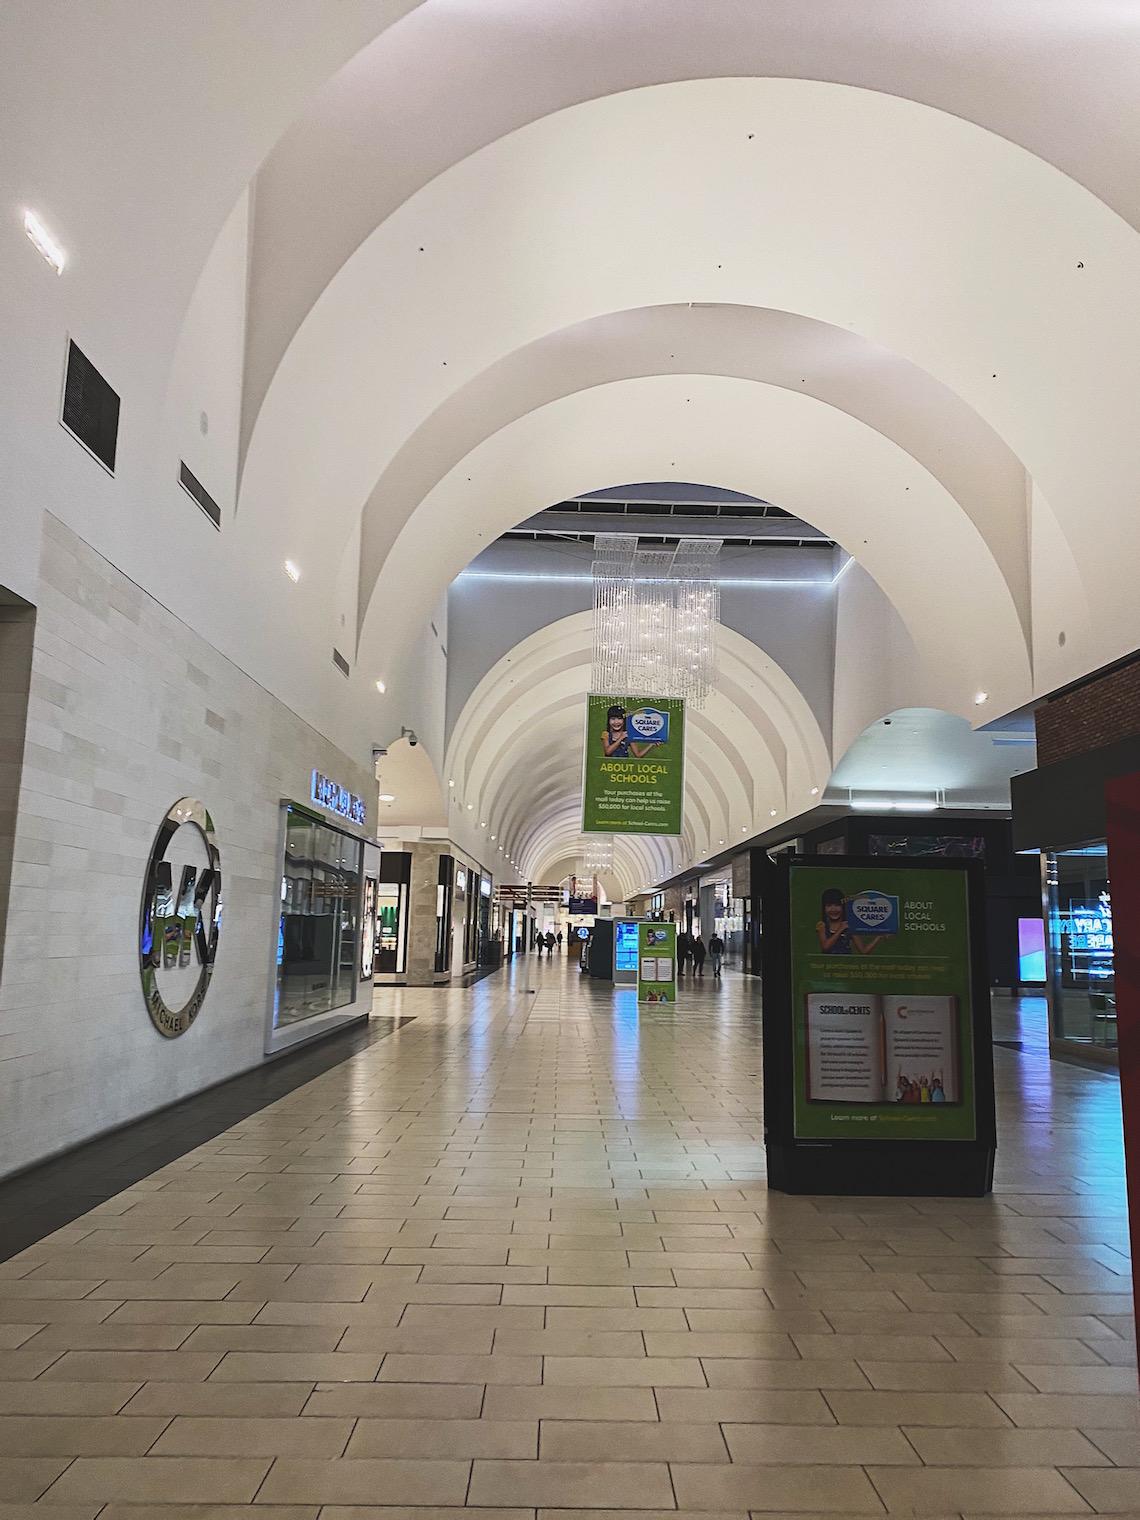 cerritos mall-march 16th 2020-covid 19-social distancing